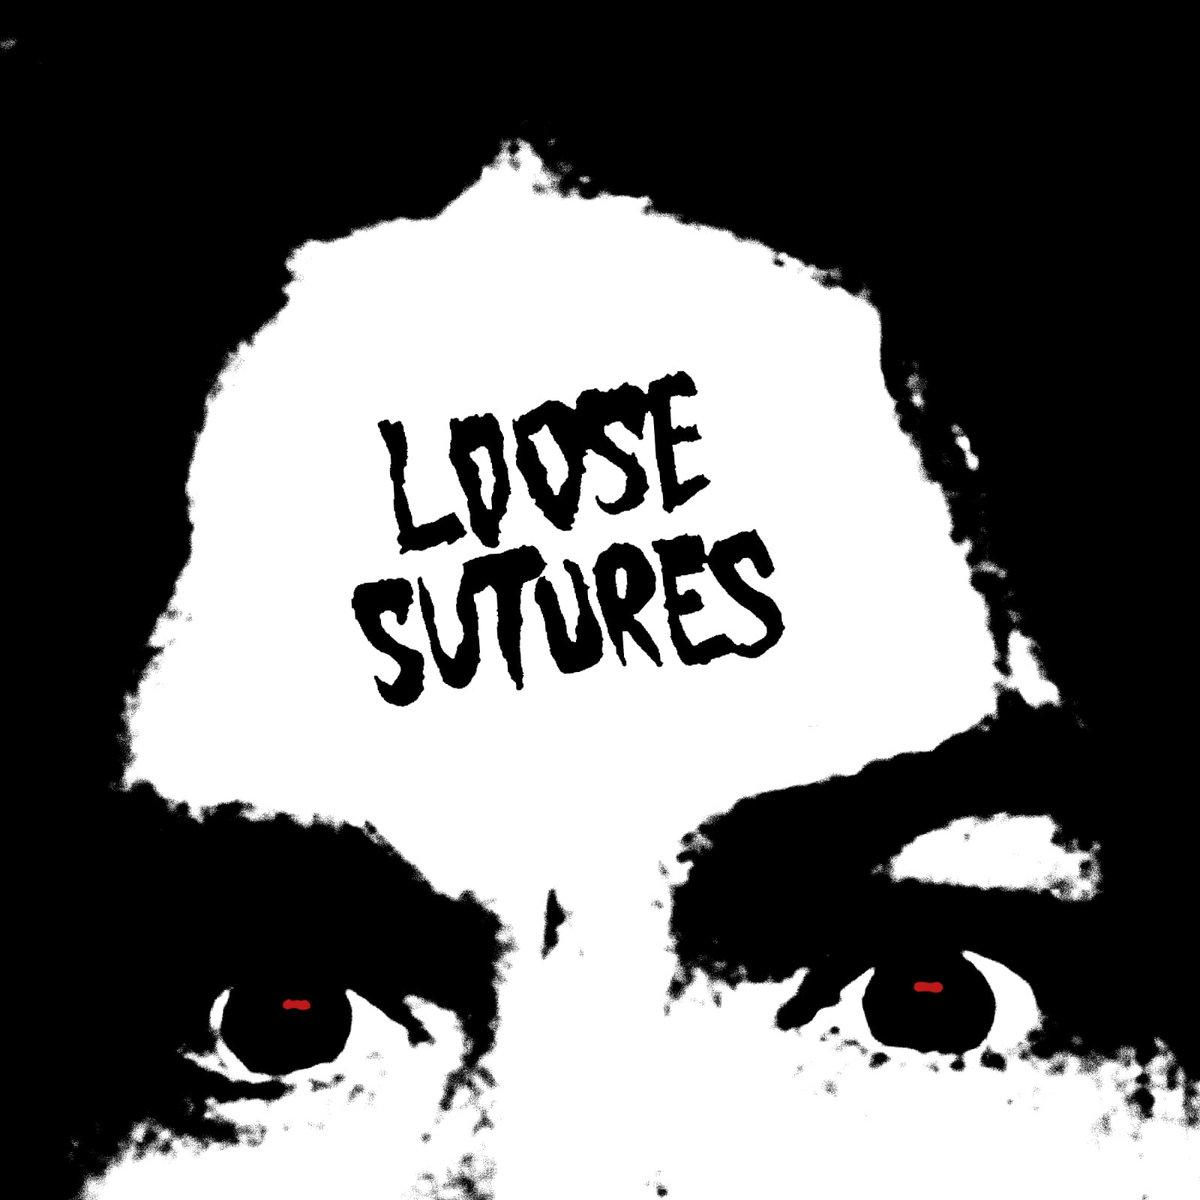 Loose Sutures - Electric Valley Record - Bandcamp - player - 2020 - Sa Scena Sarda